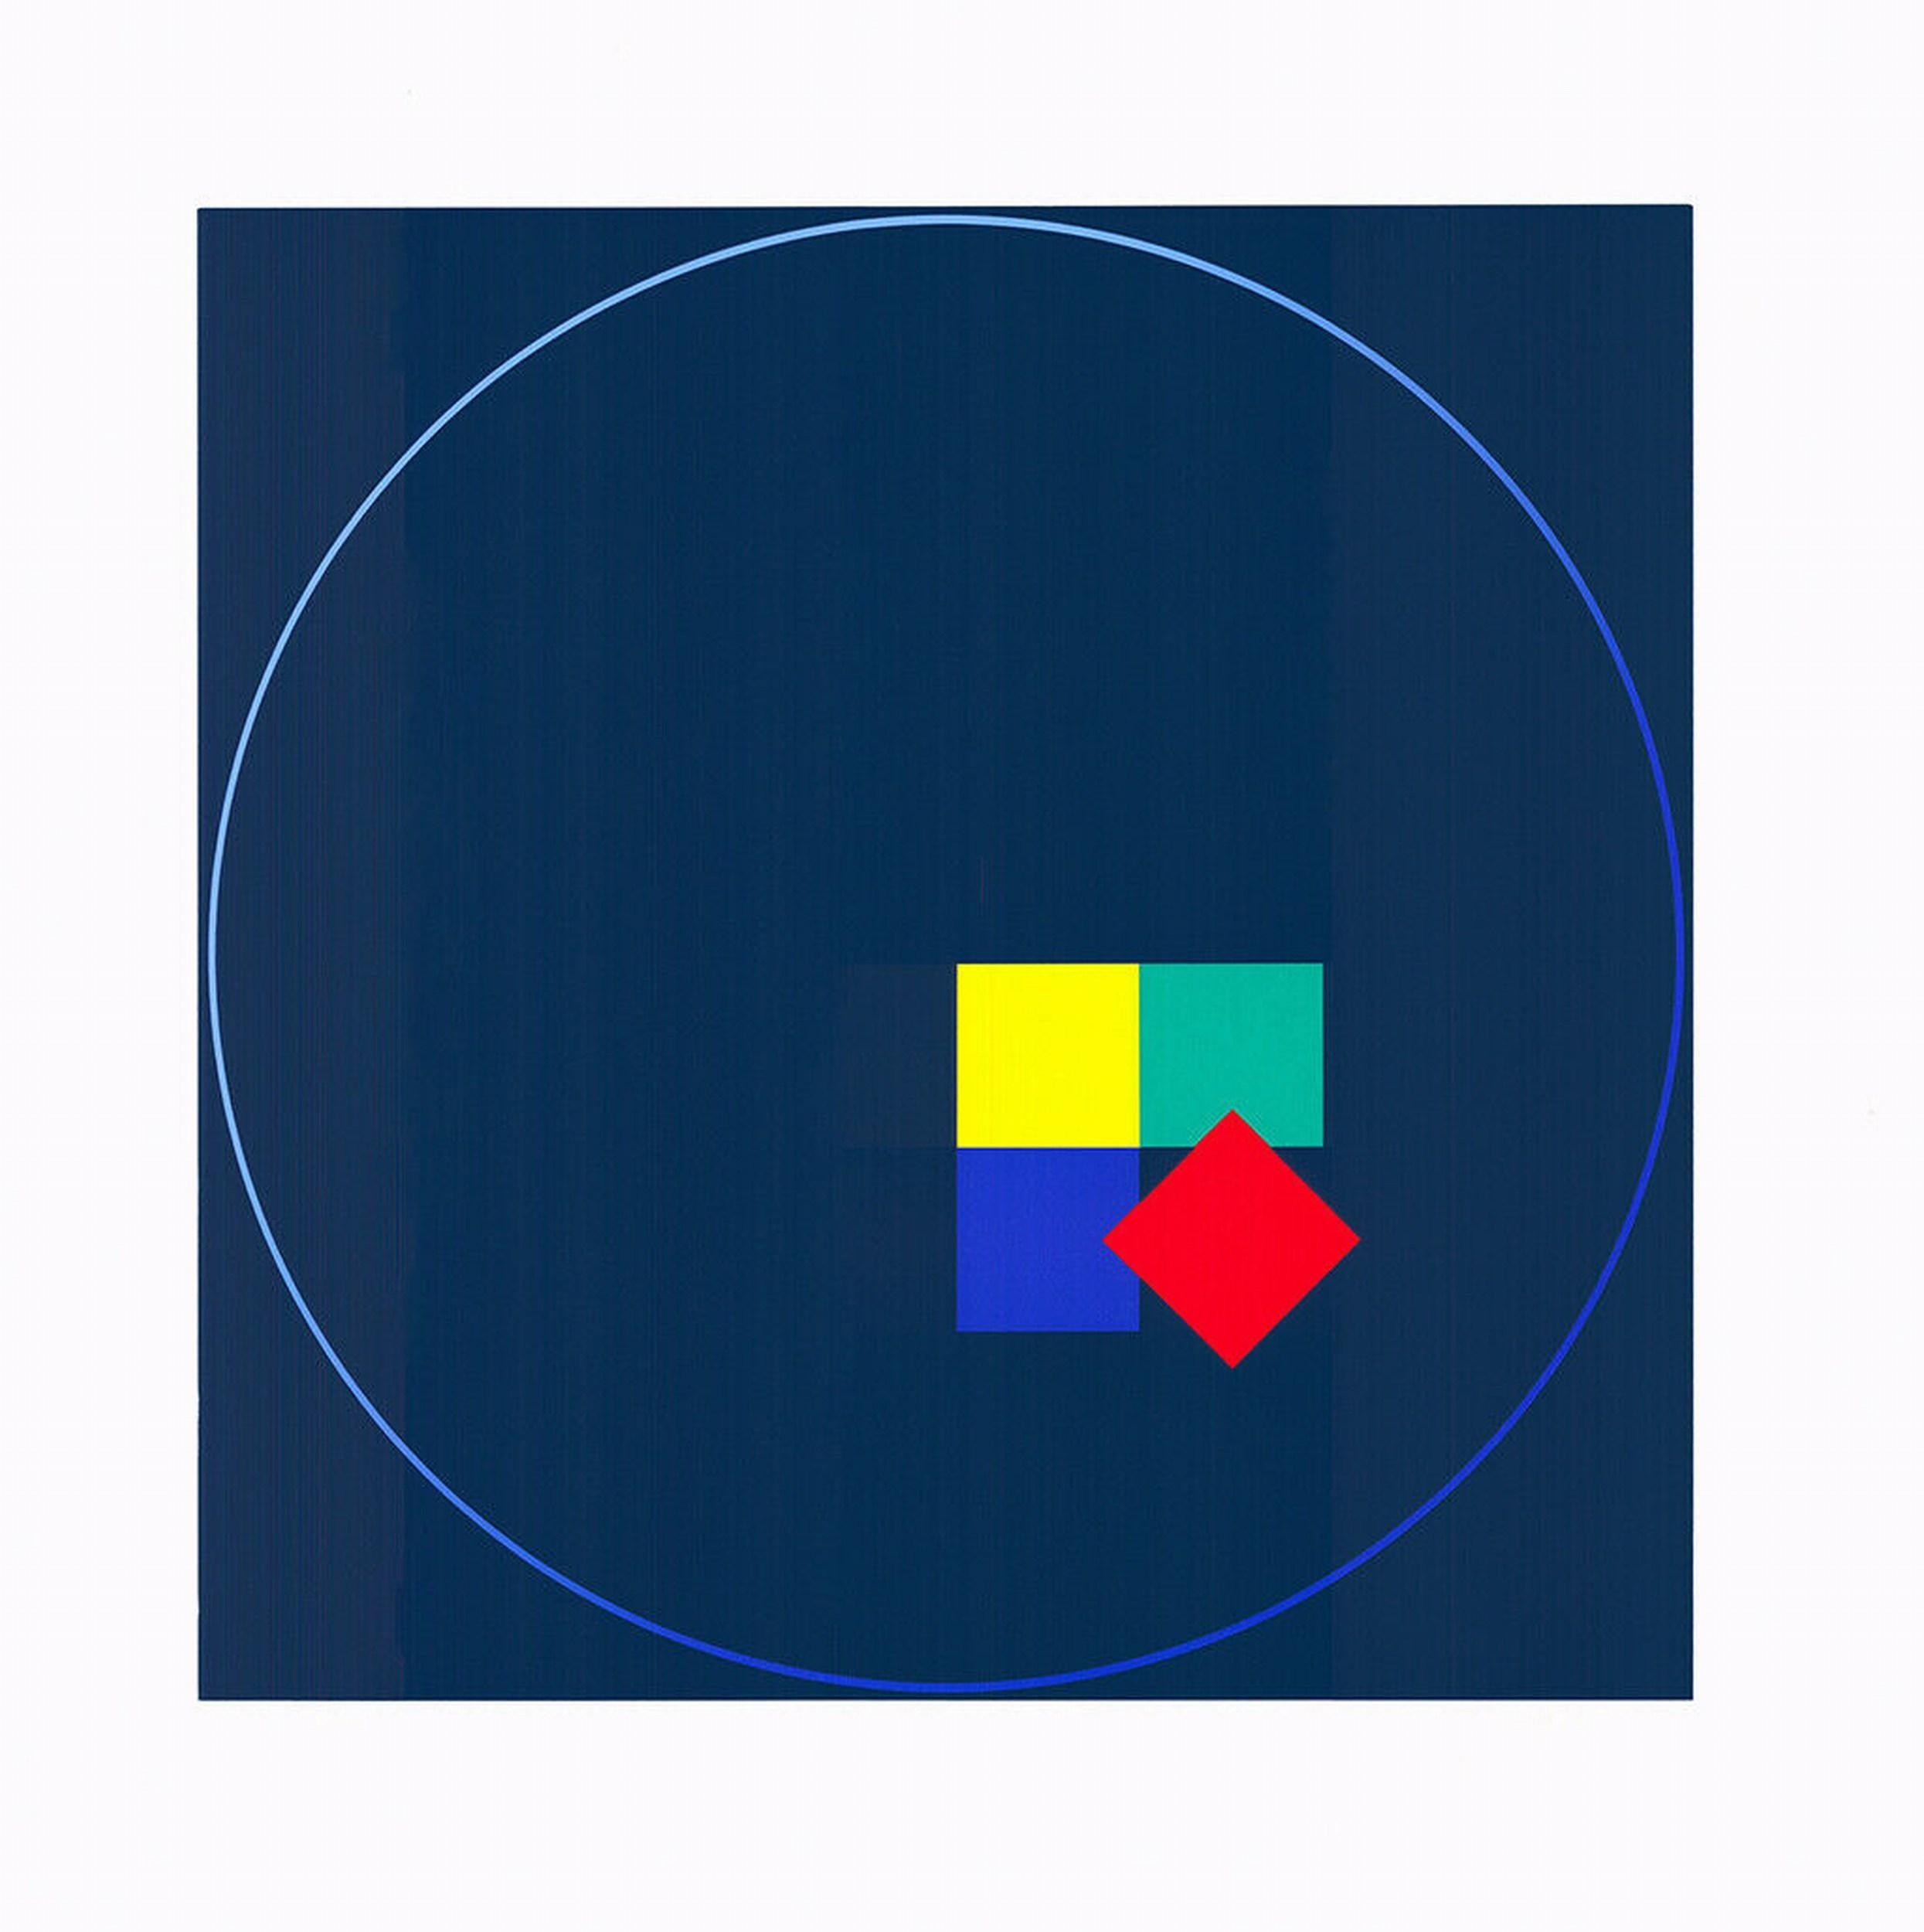 Untitled Geometric Abstraction (Konkrete Kunst, Constructivsm)